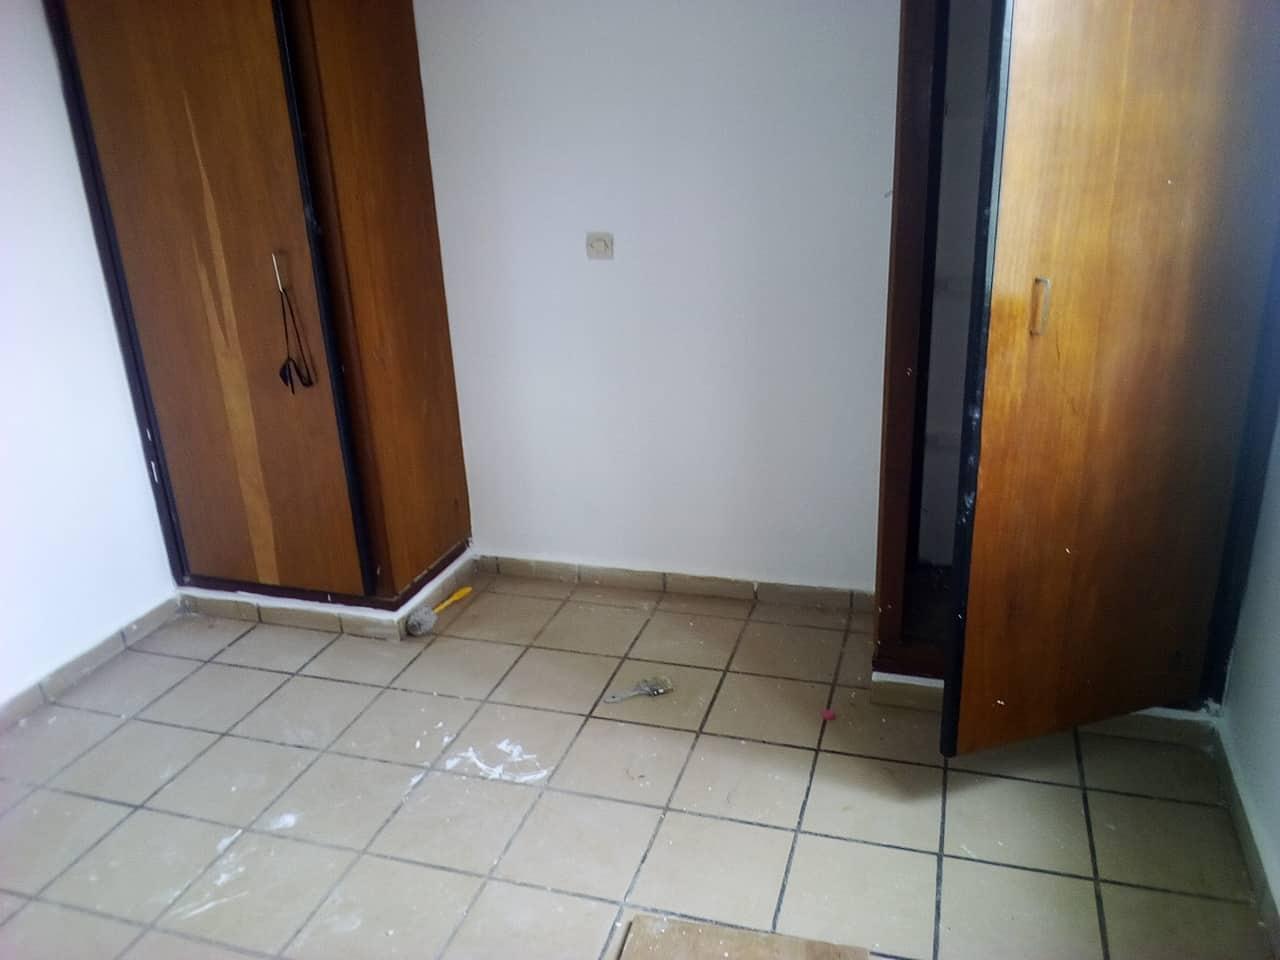 Apartment to rent - Yaoundé, Mfandena, avenue foe - 1 living room(s), 2 bedroom(s), 2 bathroom(s) - 250 000 FCFA / month